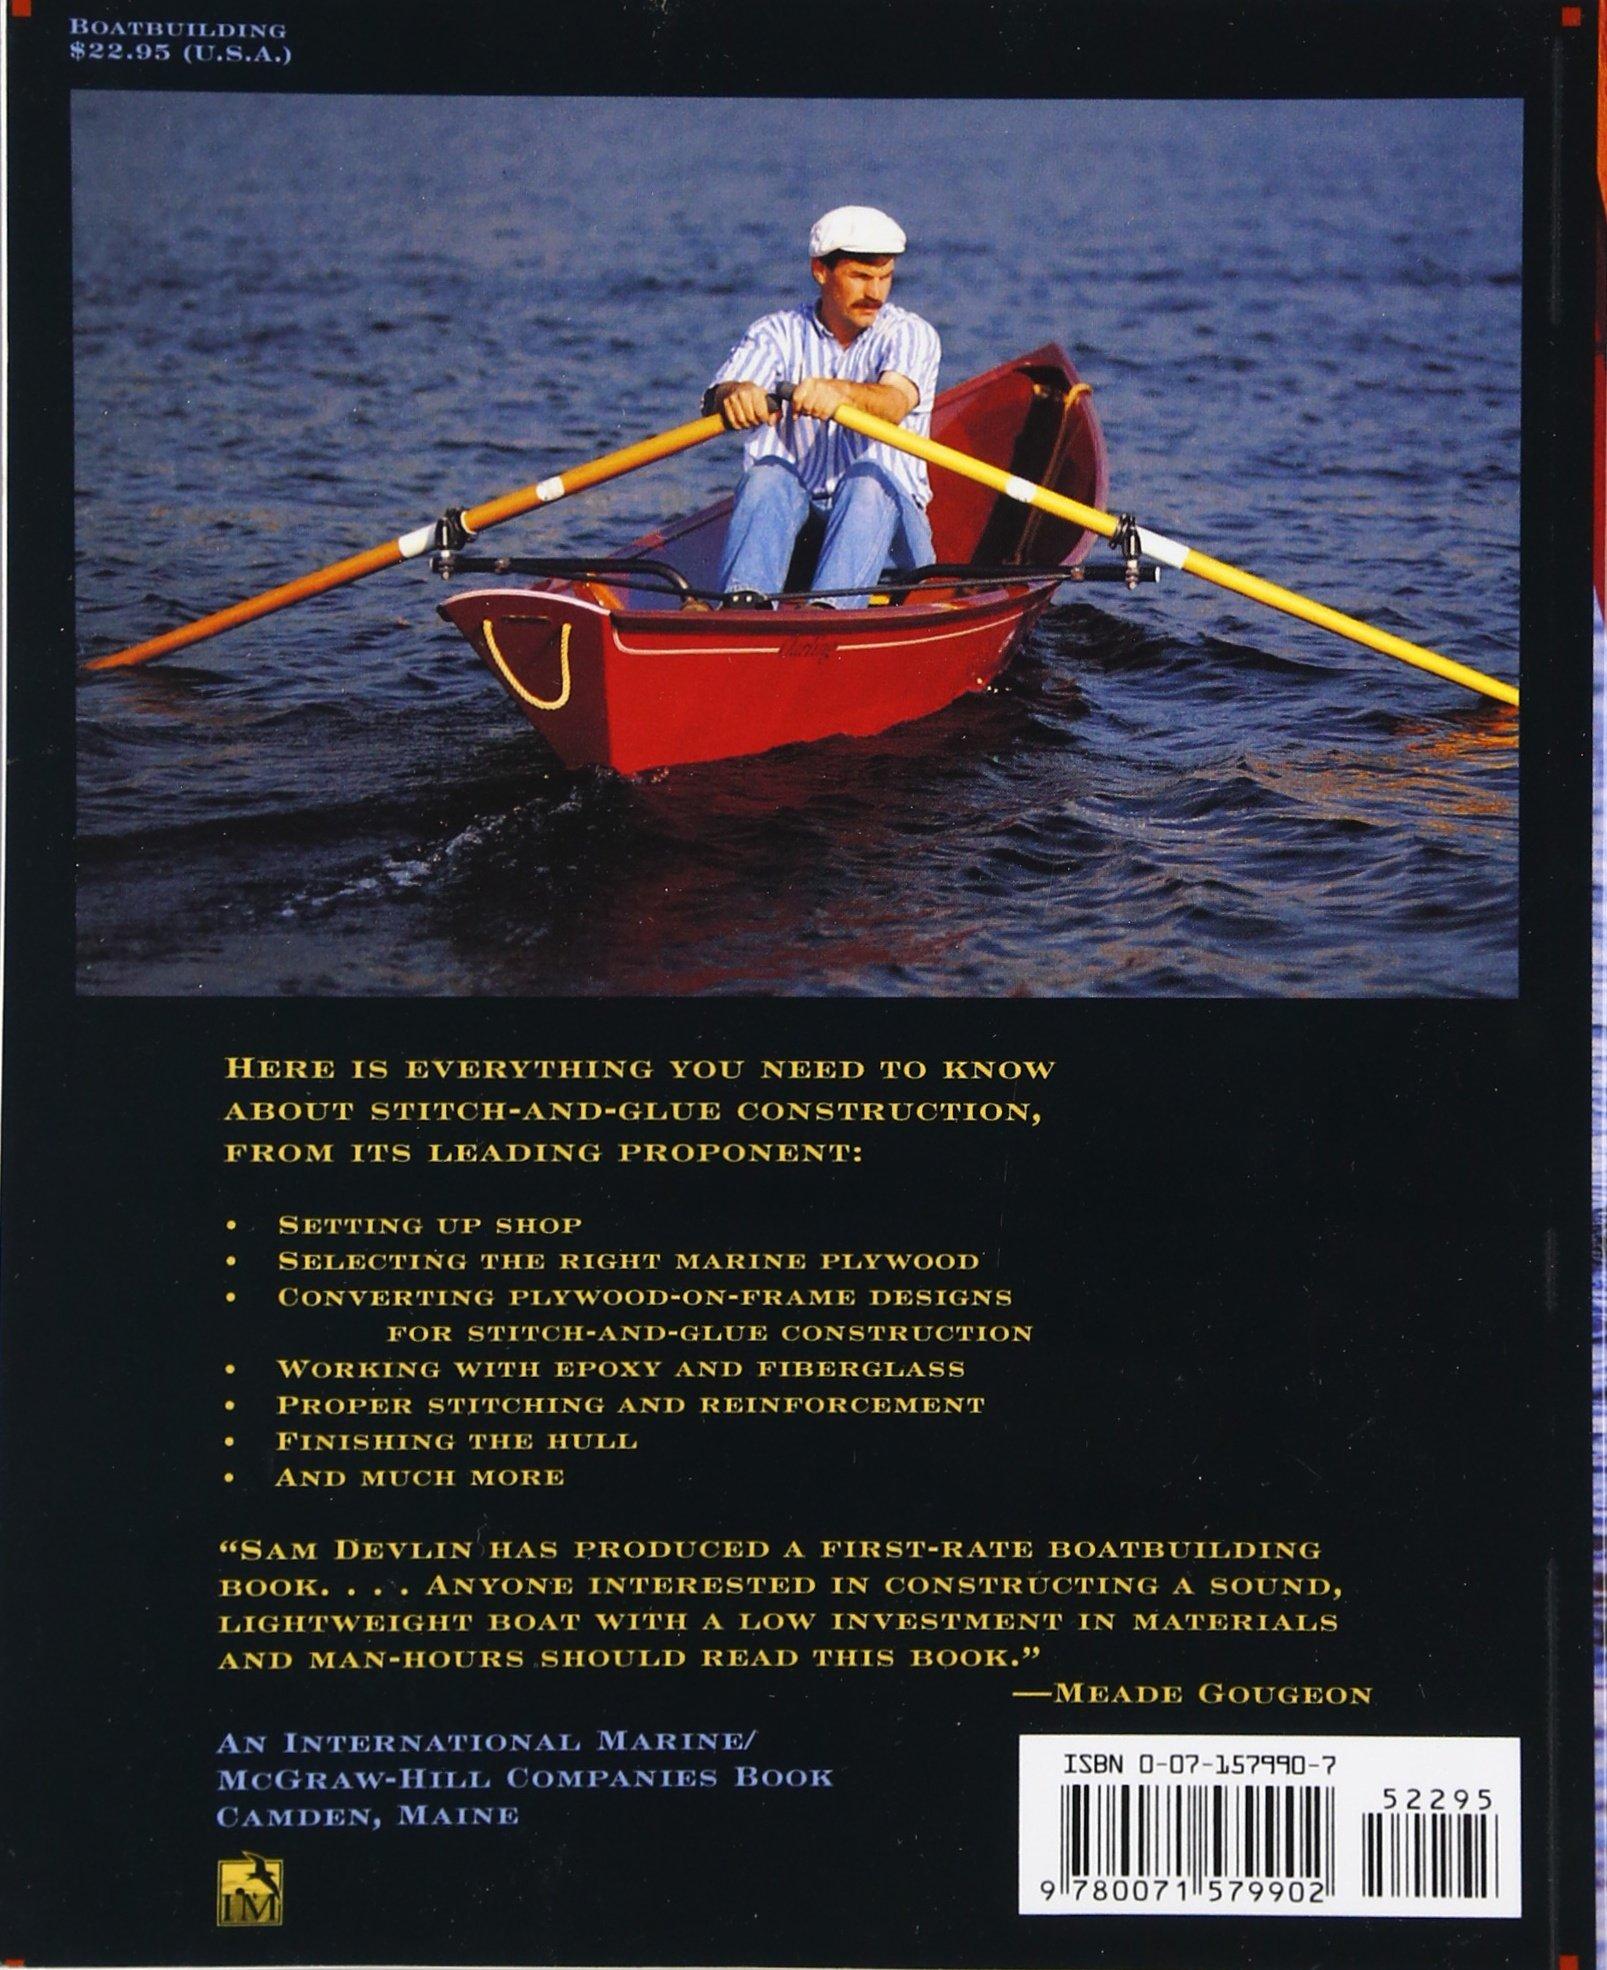 Devlin's Boatbuilding: How To Build Any Boat The Stitchandglue Way:  Samual Devlin: 8601400759950: Amazon: Books